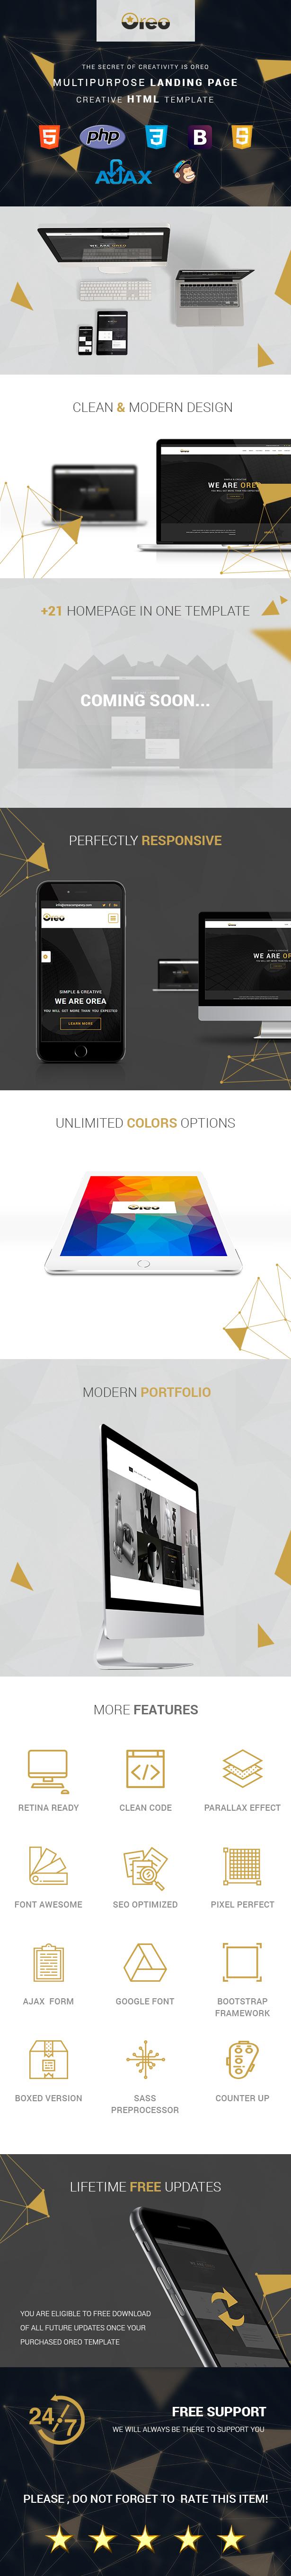 Oreo - Ultimate Creative Landing Page - 3